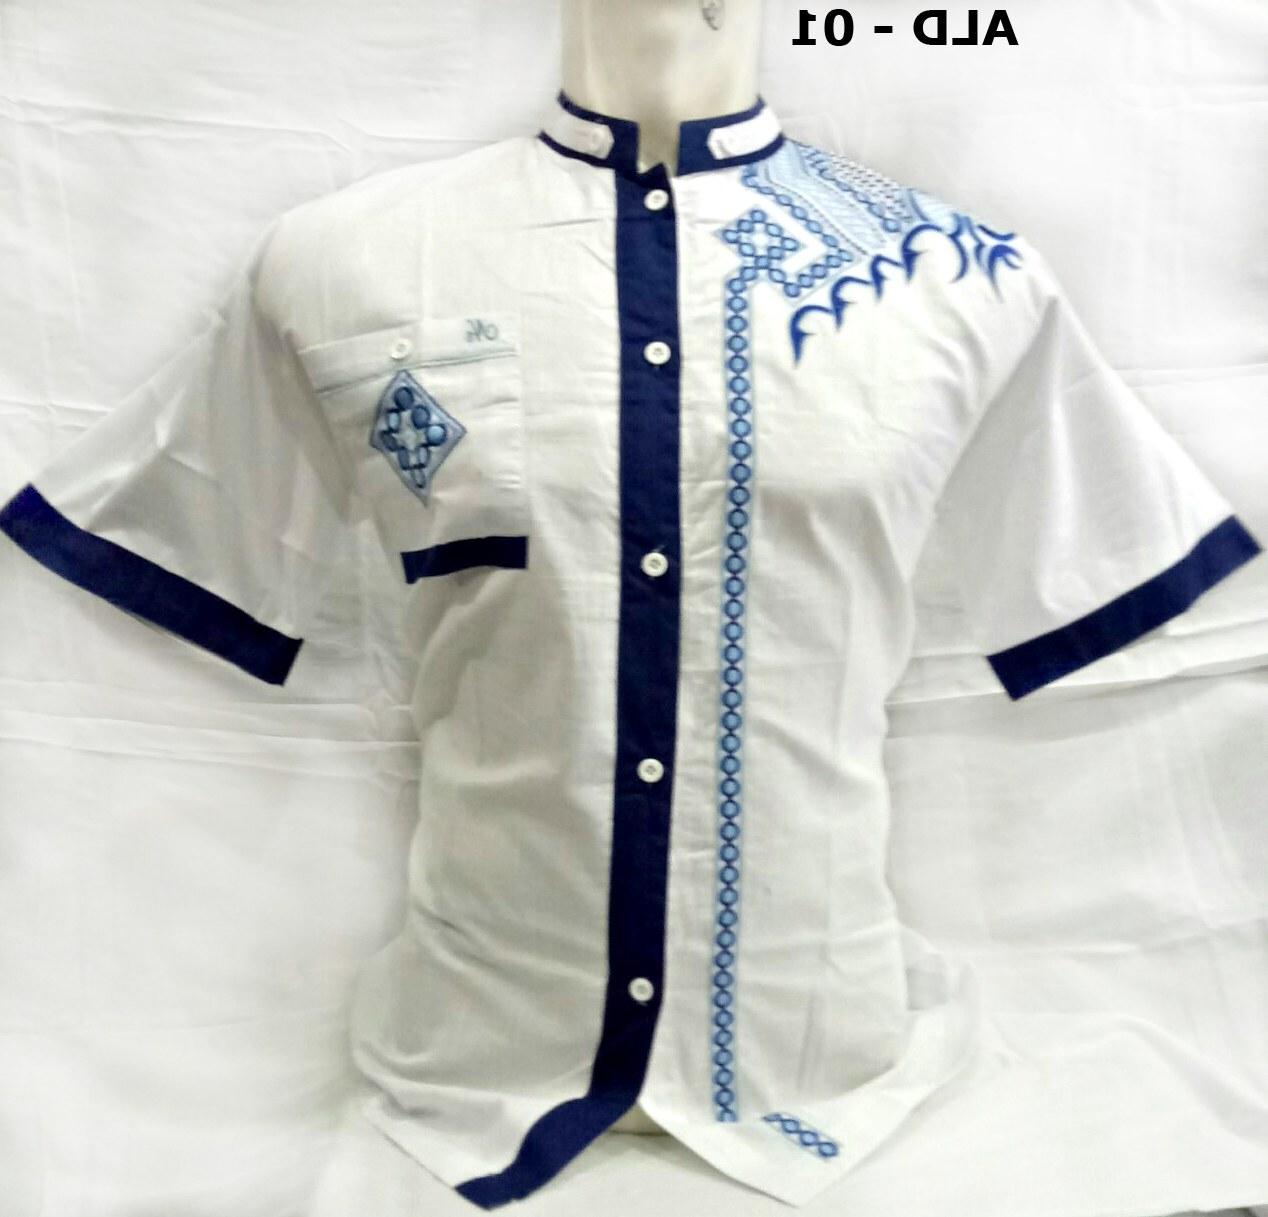 Bentuk Harga Baju Lebaran Q5df Model Baju Koko Lebaran 2018 Terbaru Dan Harganya Murah